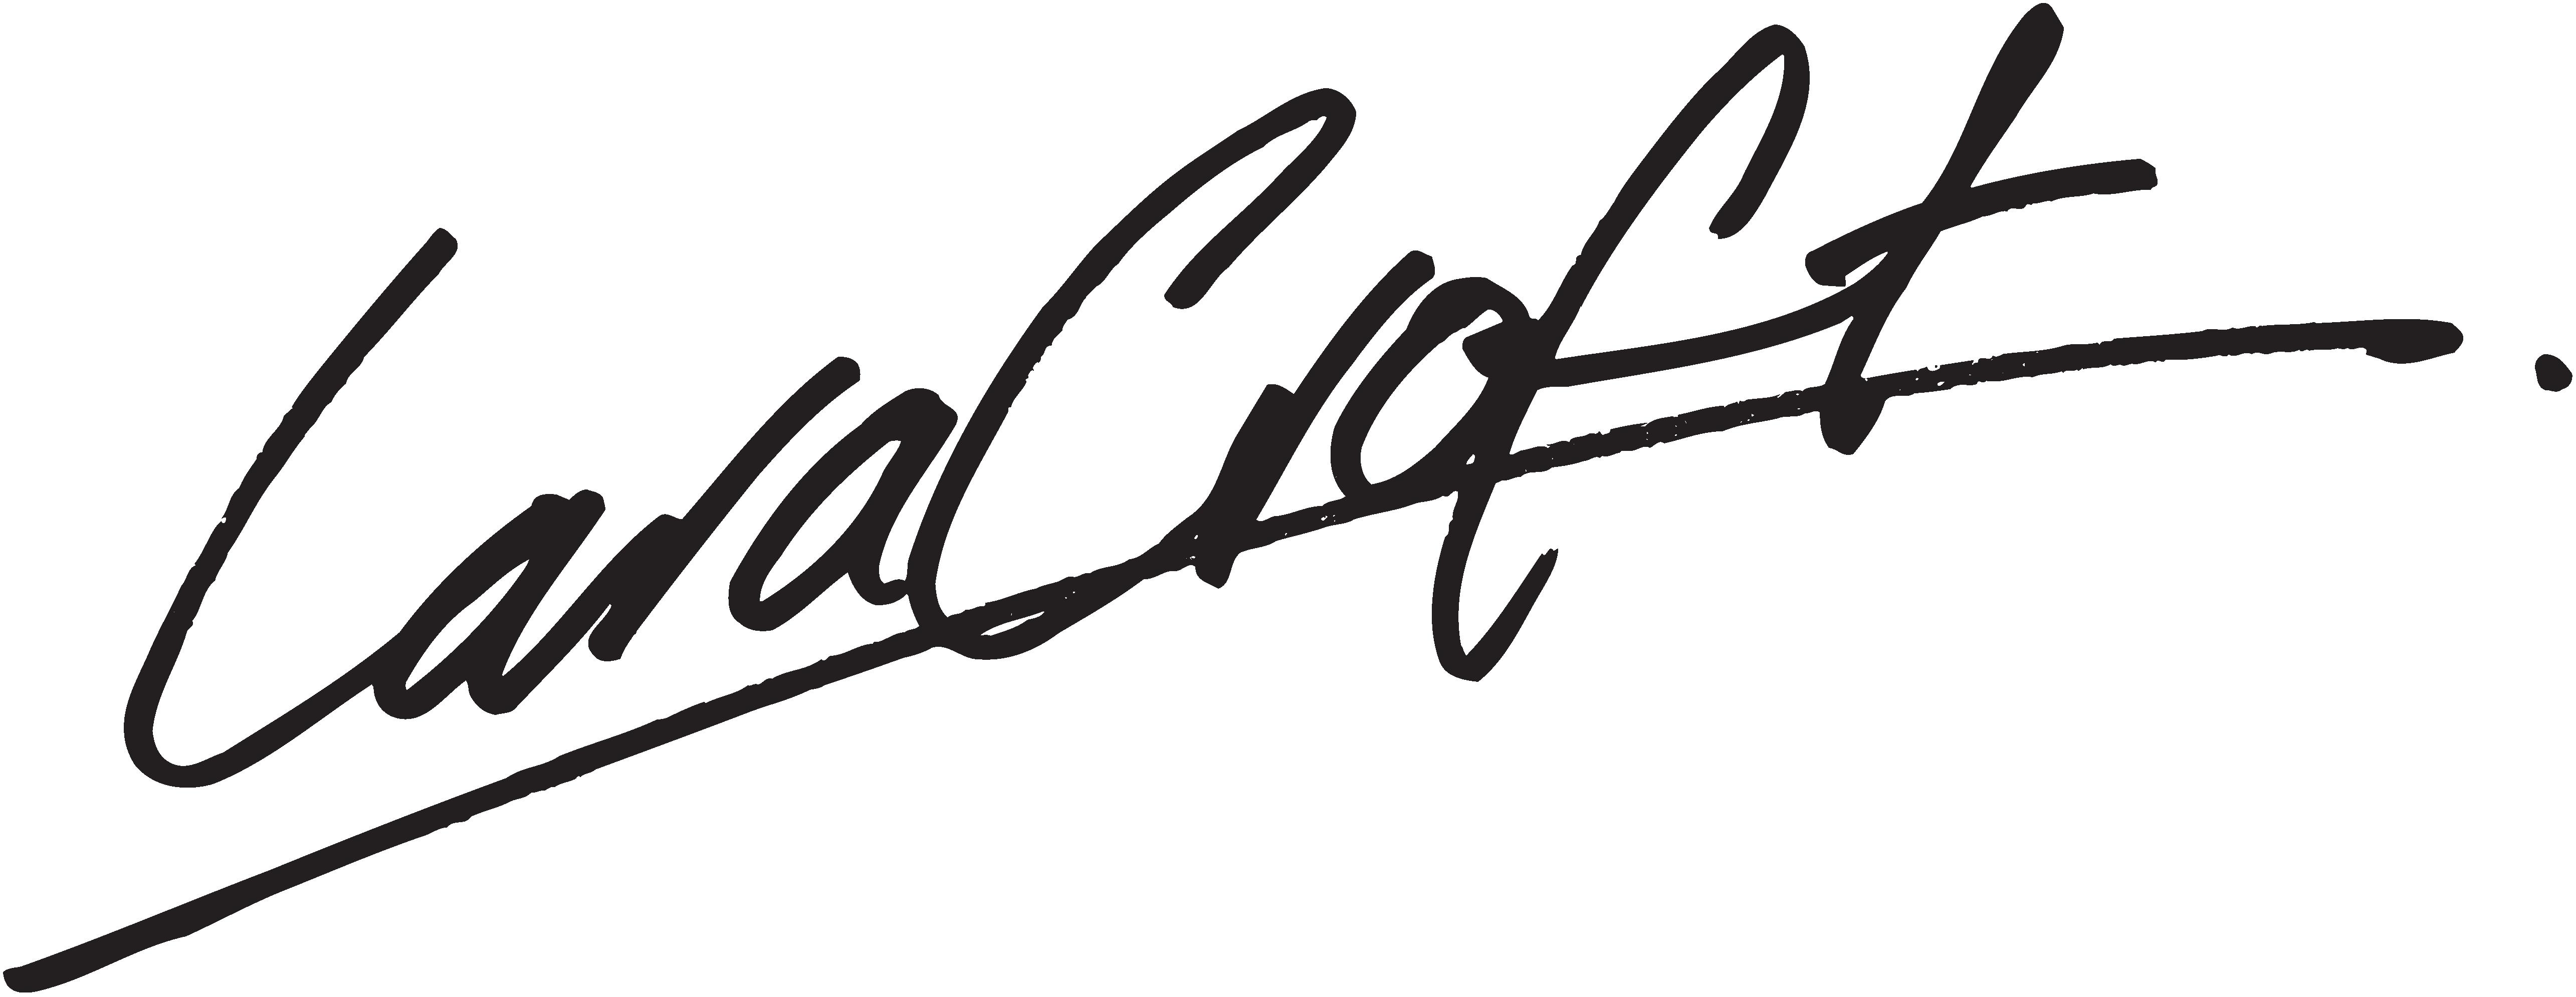 Converting png to vector. Adobe illustrator convert signature